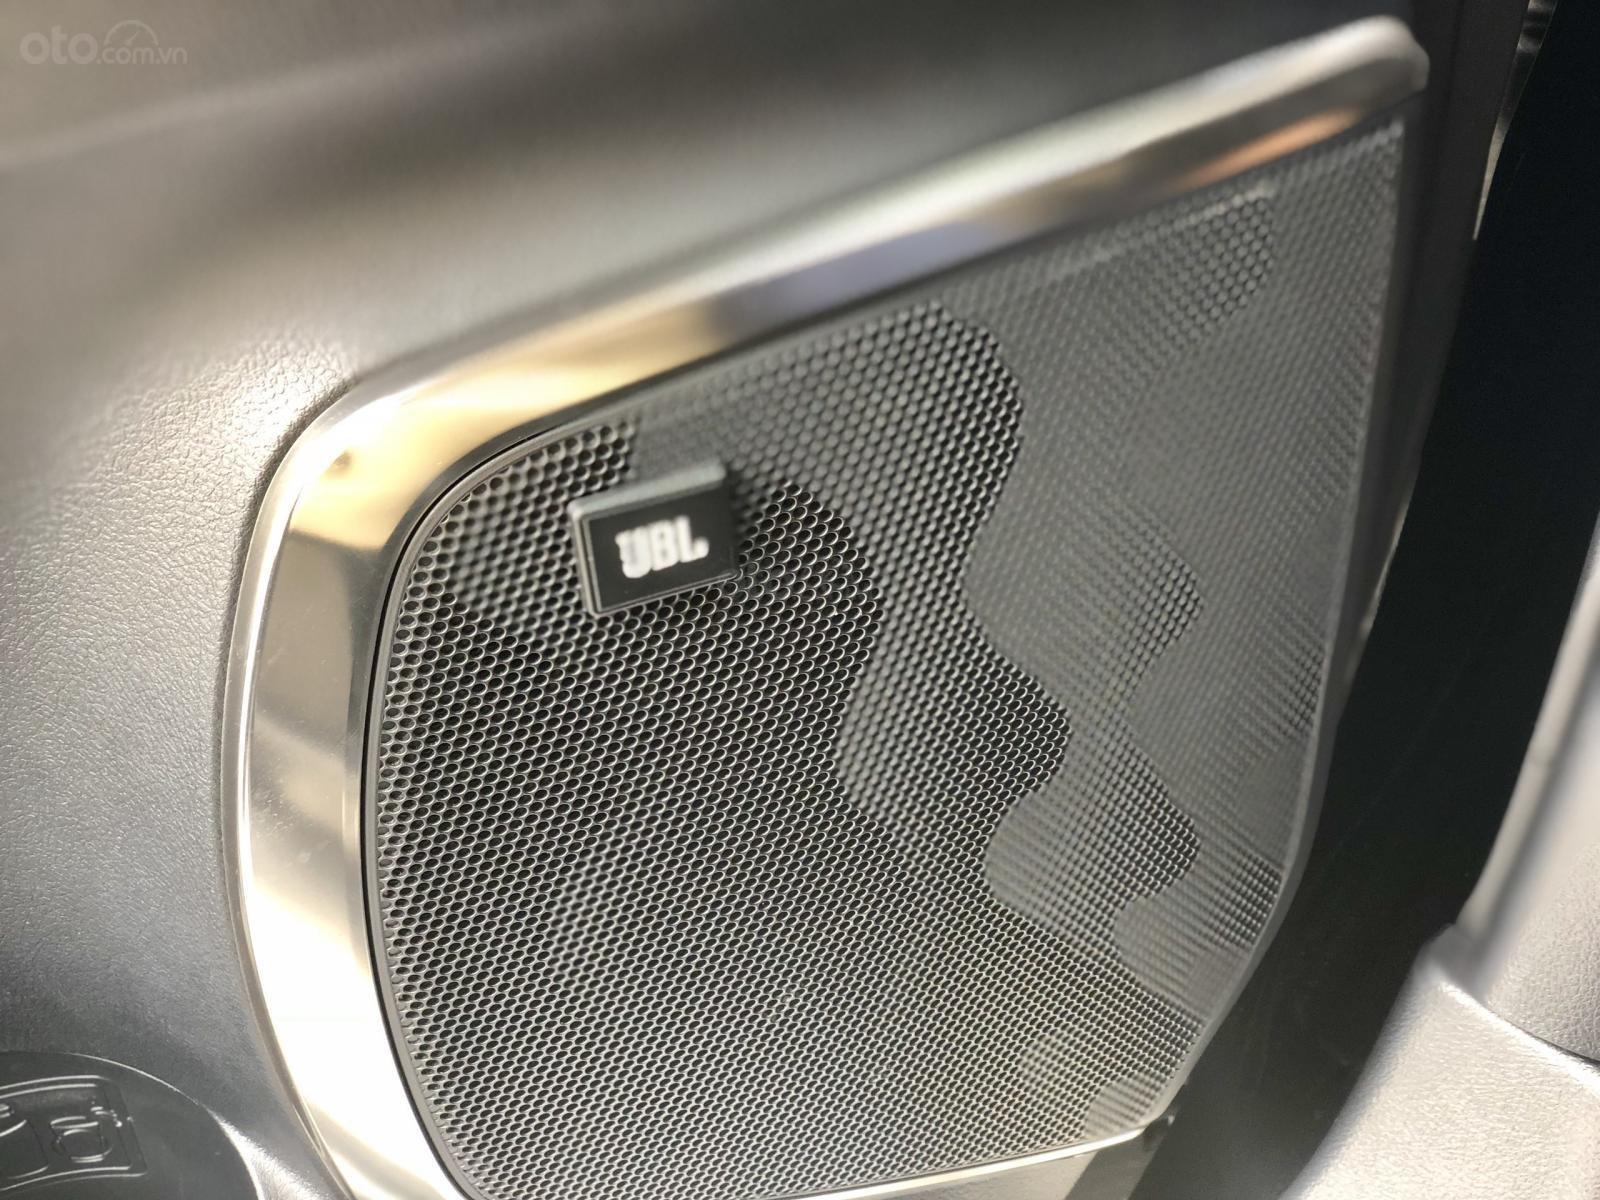 Bán Toyota Alphard 3.5L - V6 sản xuất 2017 model 2018, Mr Huân 0981010161 (6)